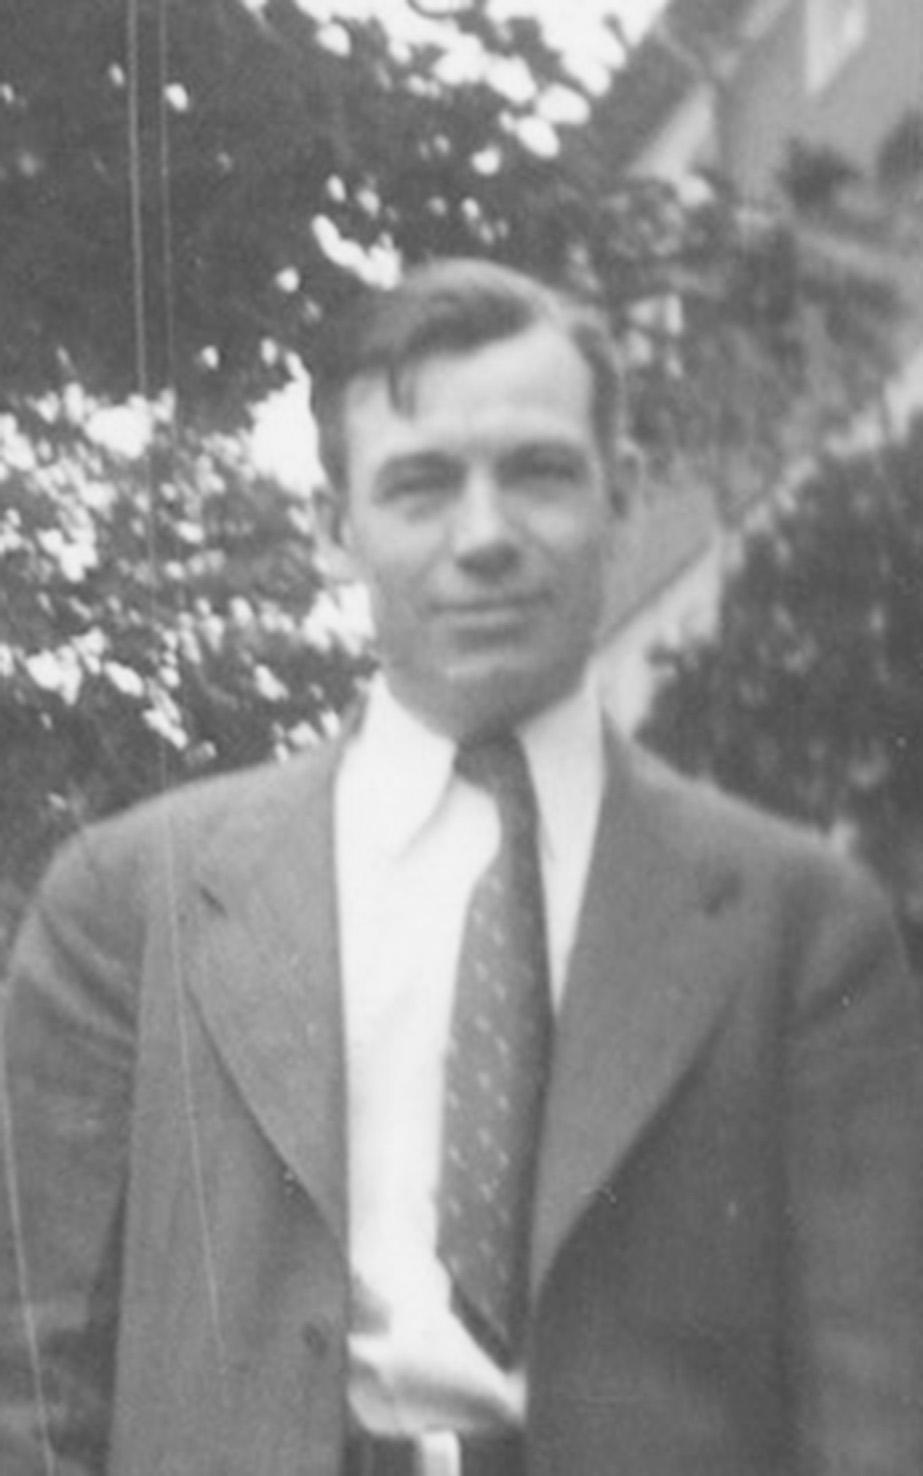 The Francis J. Mullin Memorial Scholarship